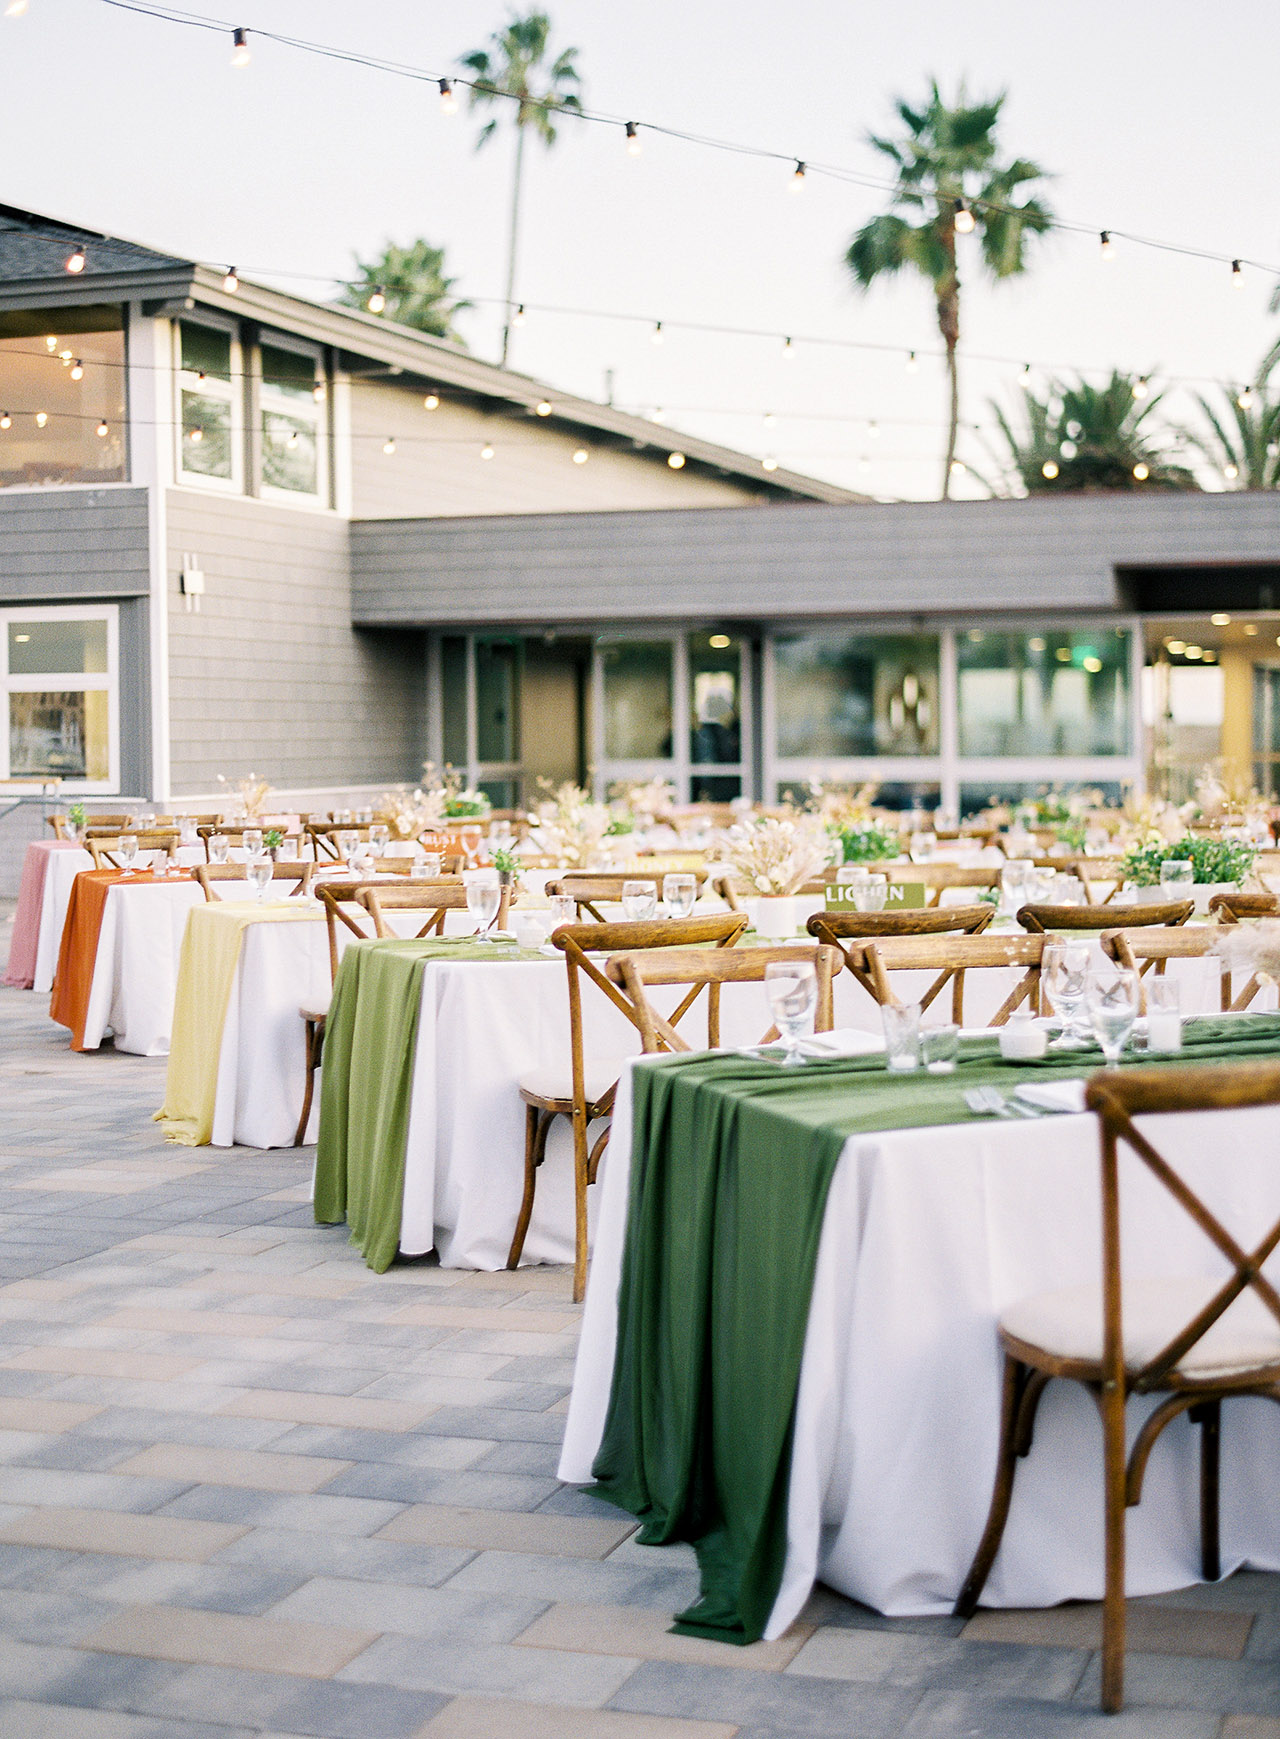 janelle stephen wedding reception tables